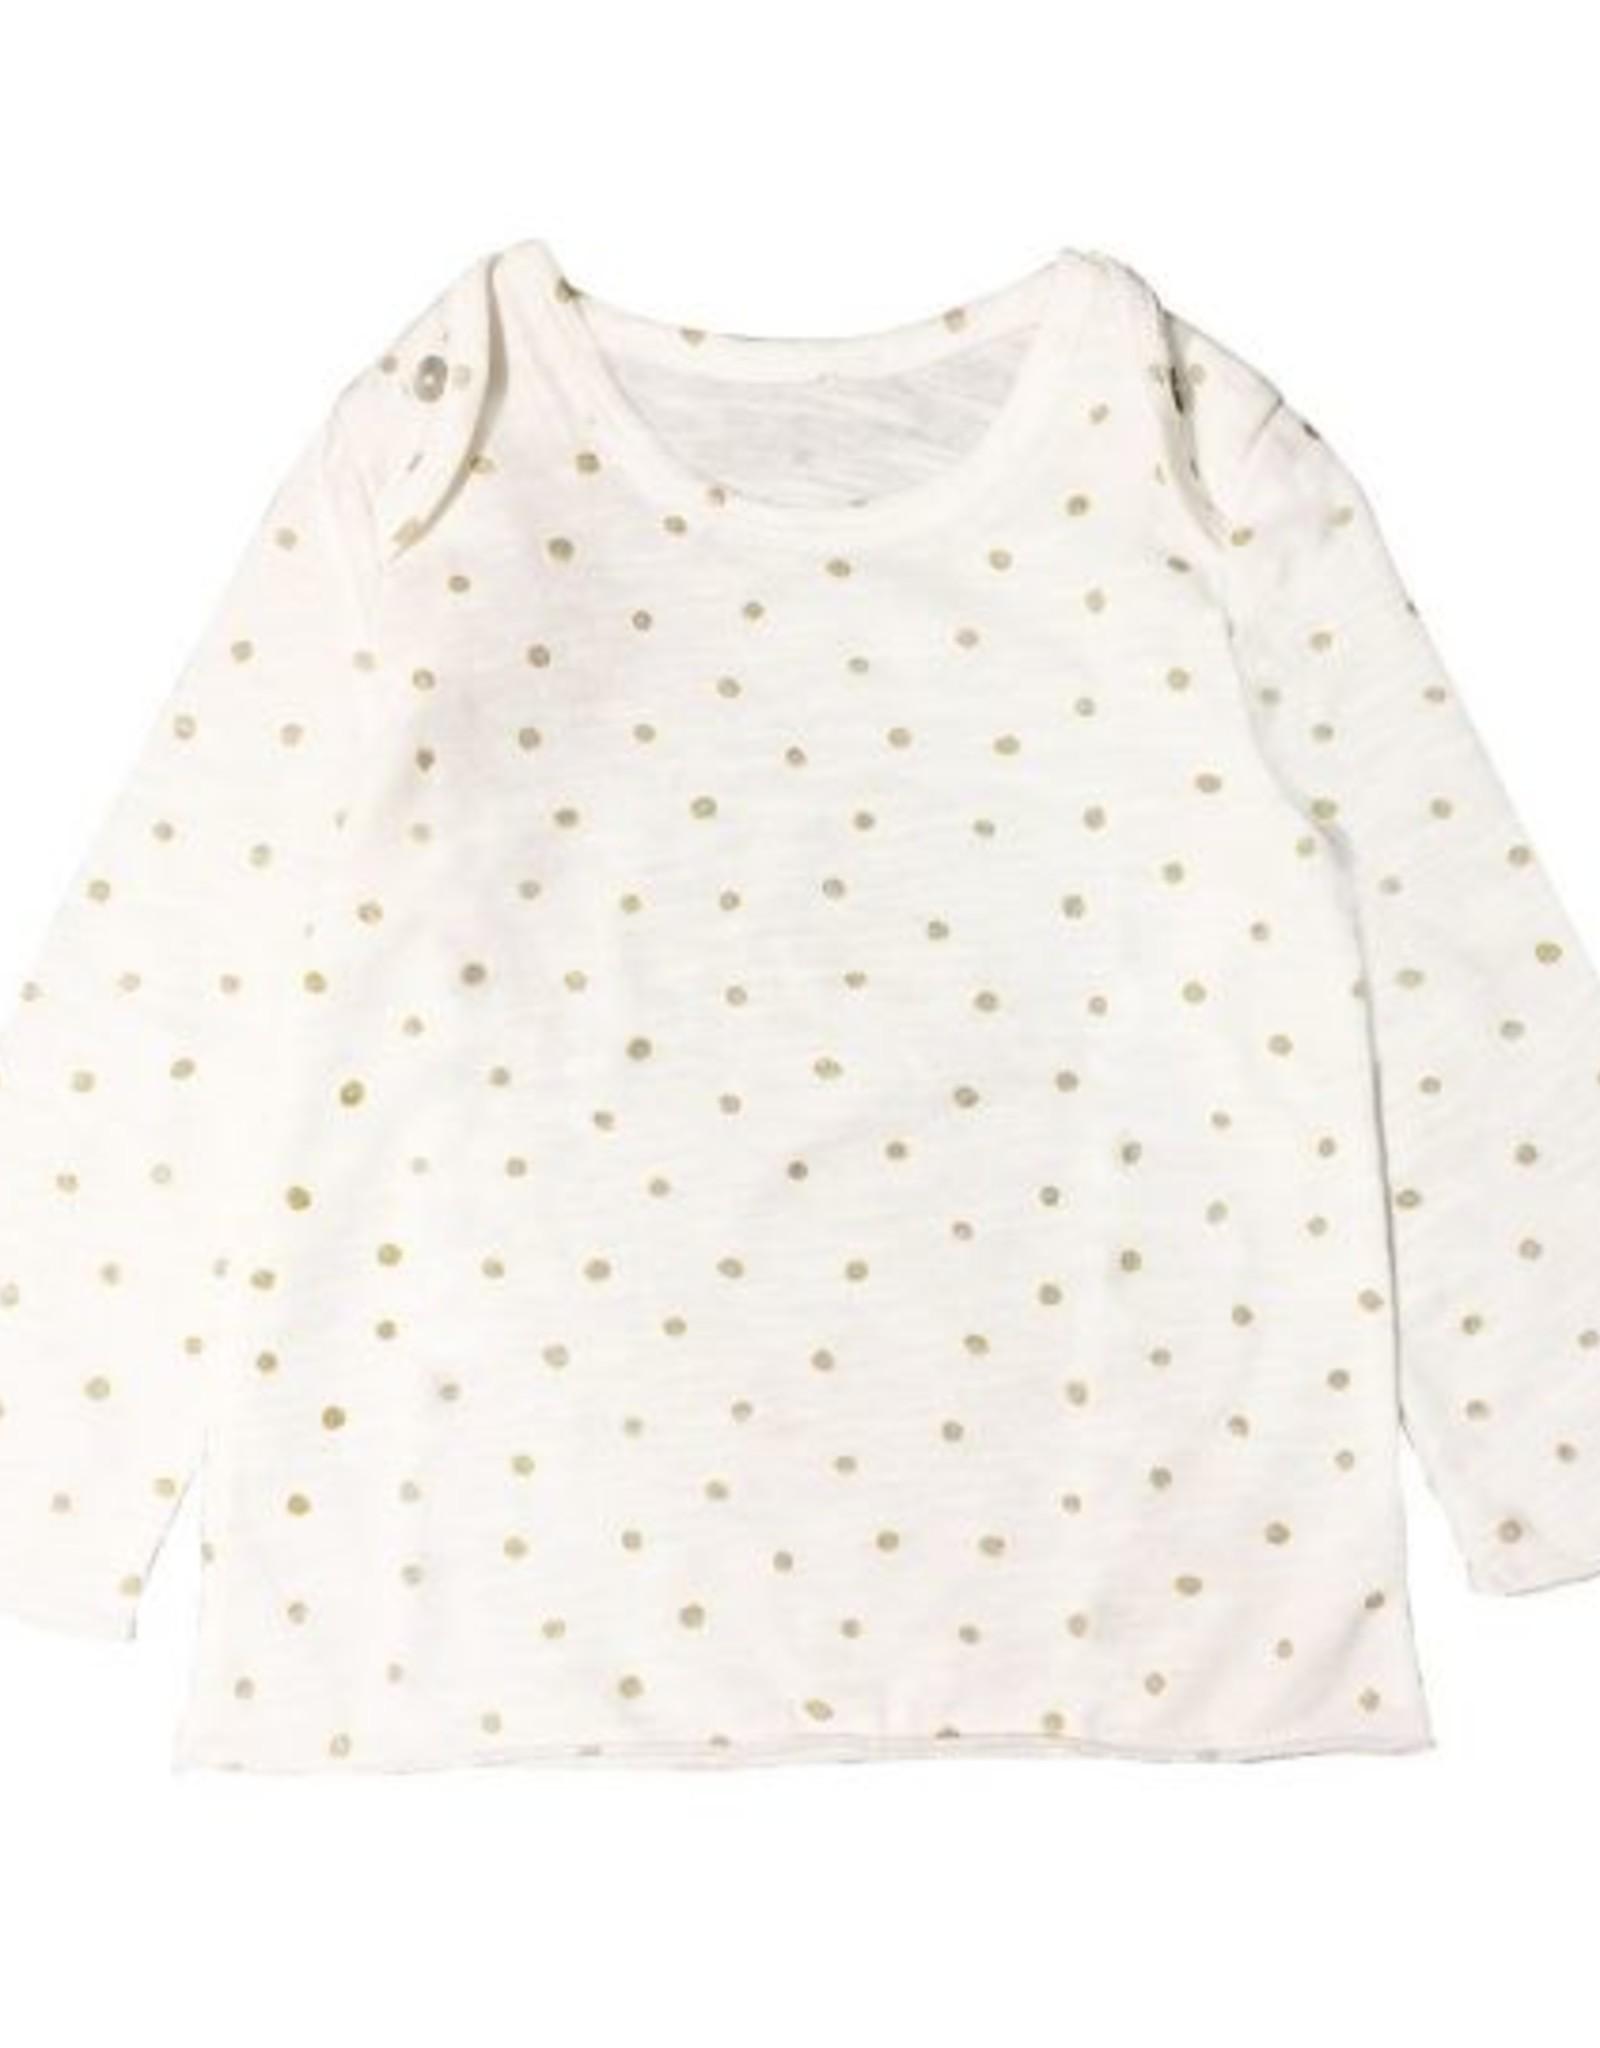 Bouchon t-shirt